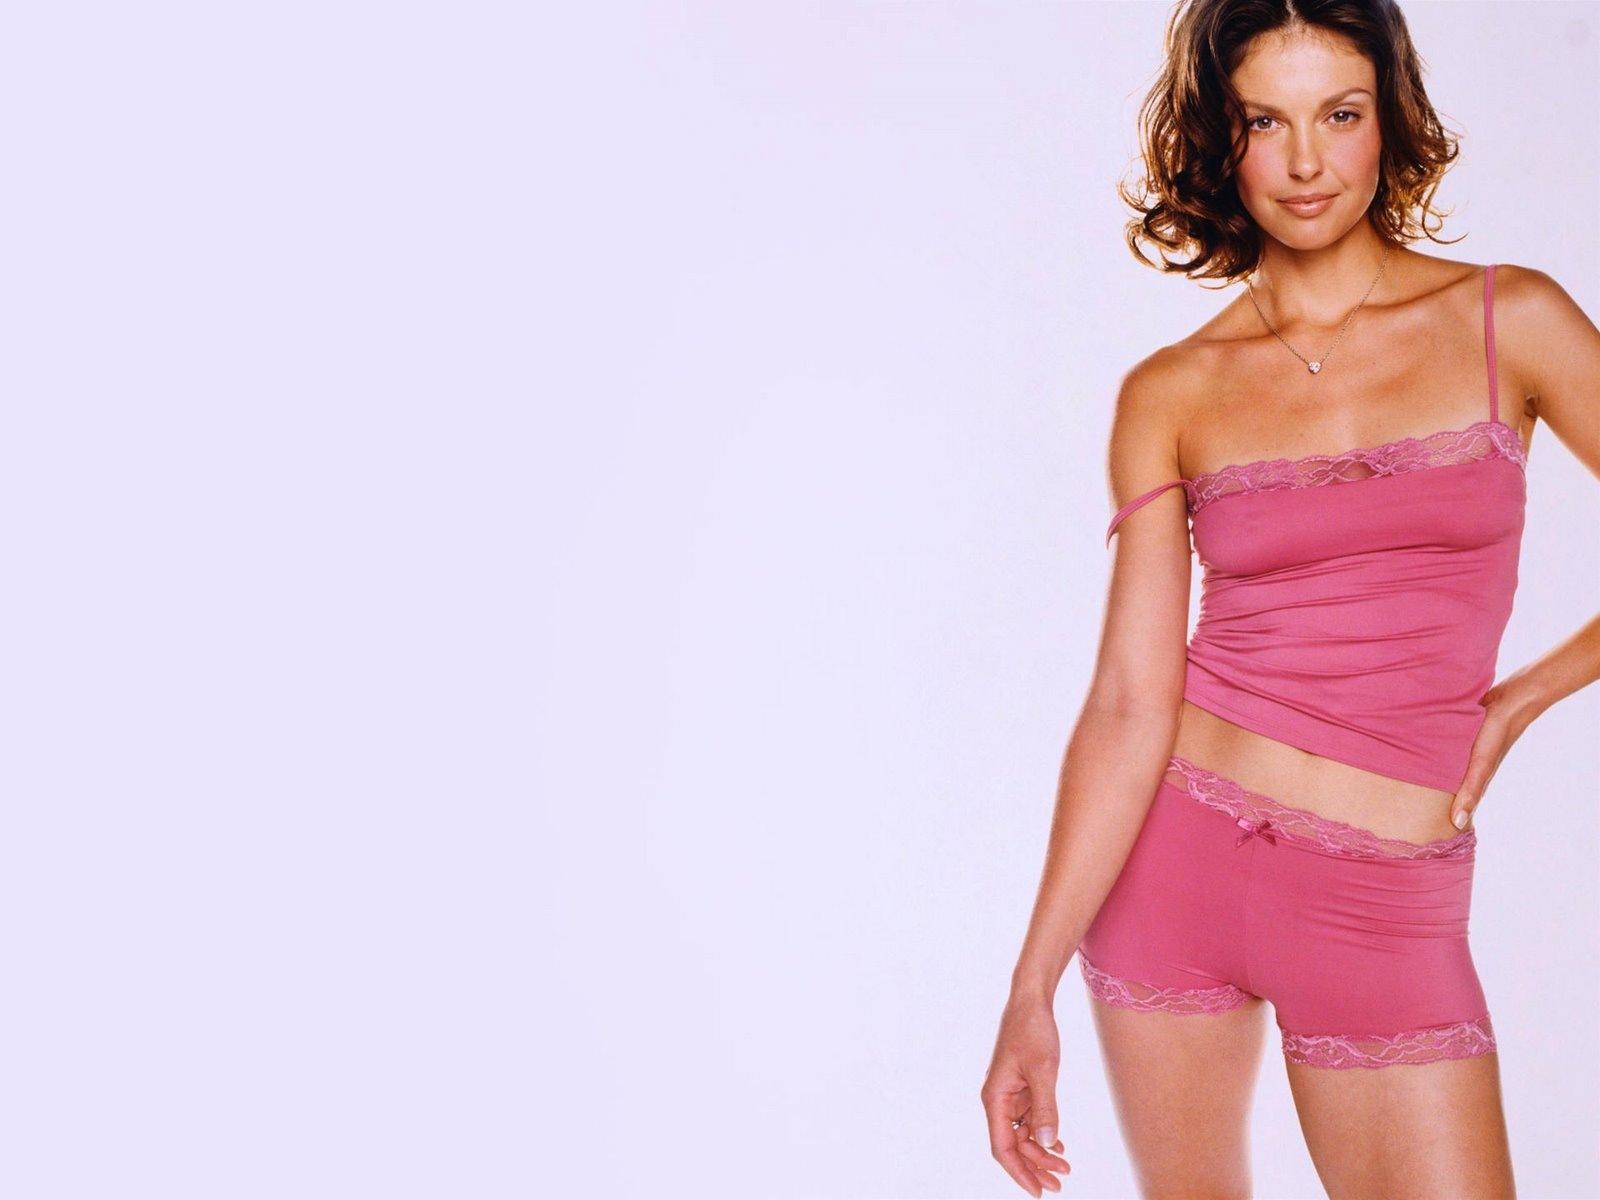 [Ashley Judd 12 1600x1200 hqmodelwallpapers[2].jpg]